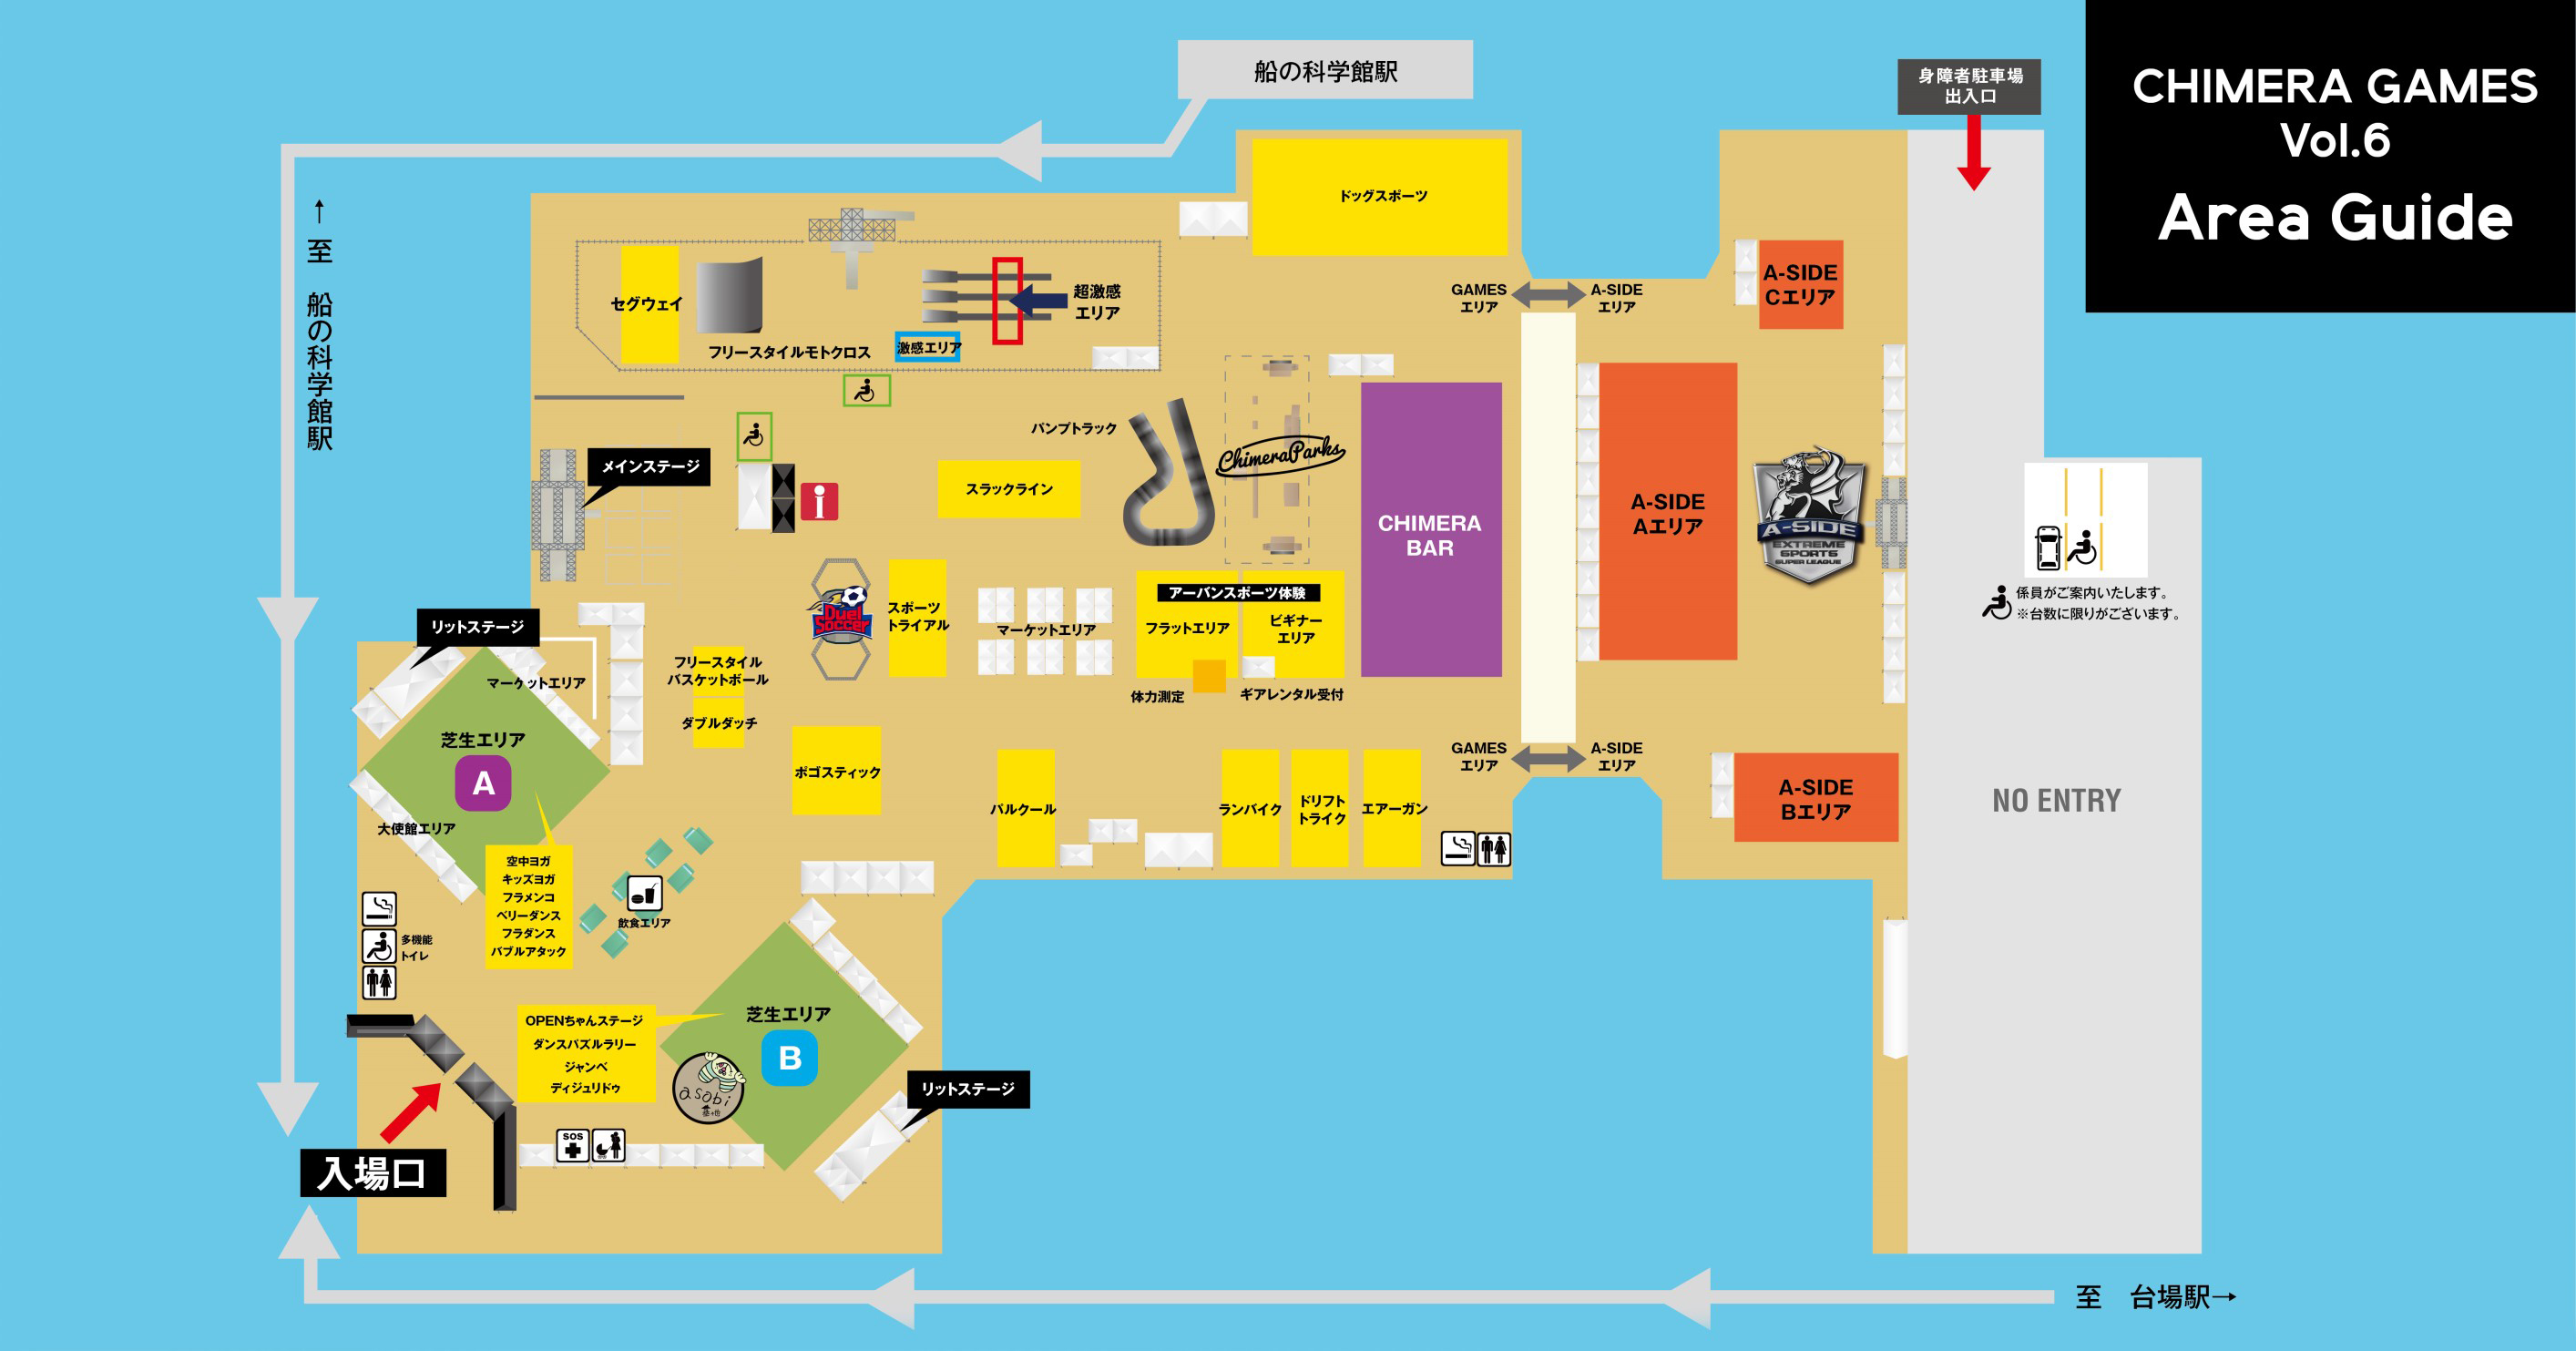 CHIMERA GAMES VOL.6 AREA MAP